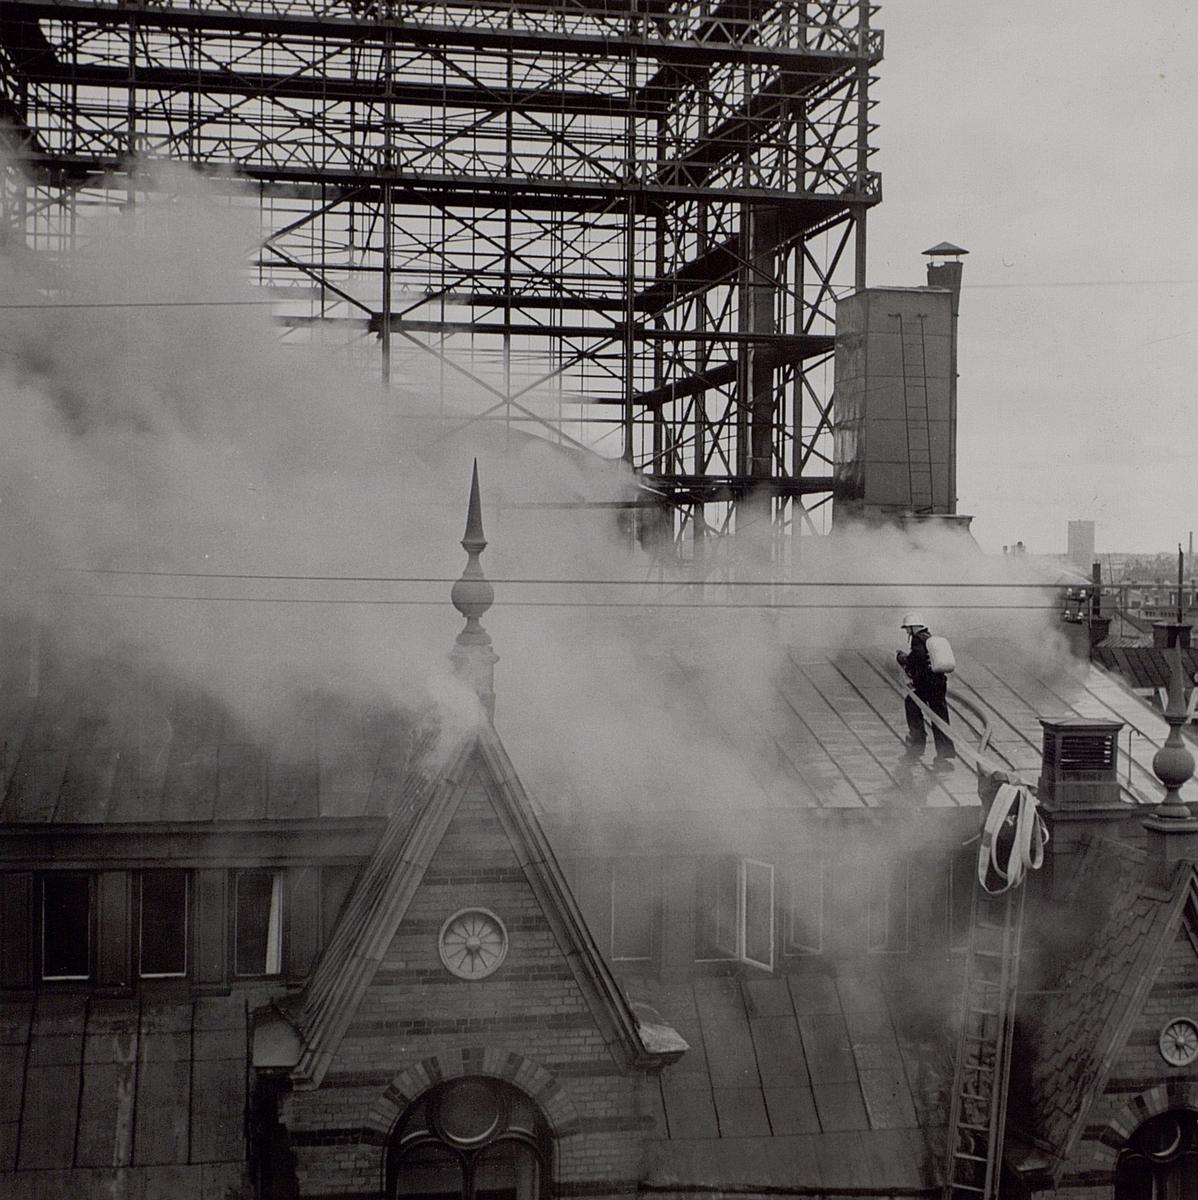 Telefontornet. Branden den 23 juli 1952.